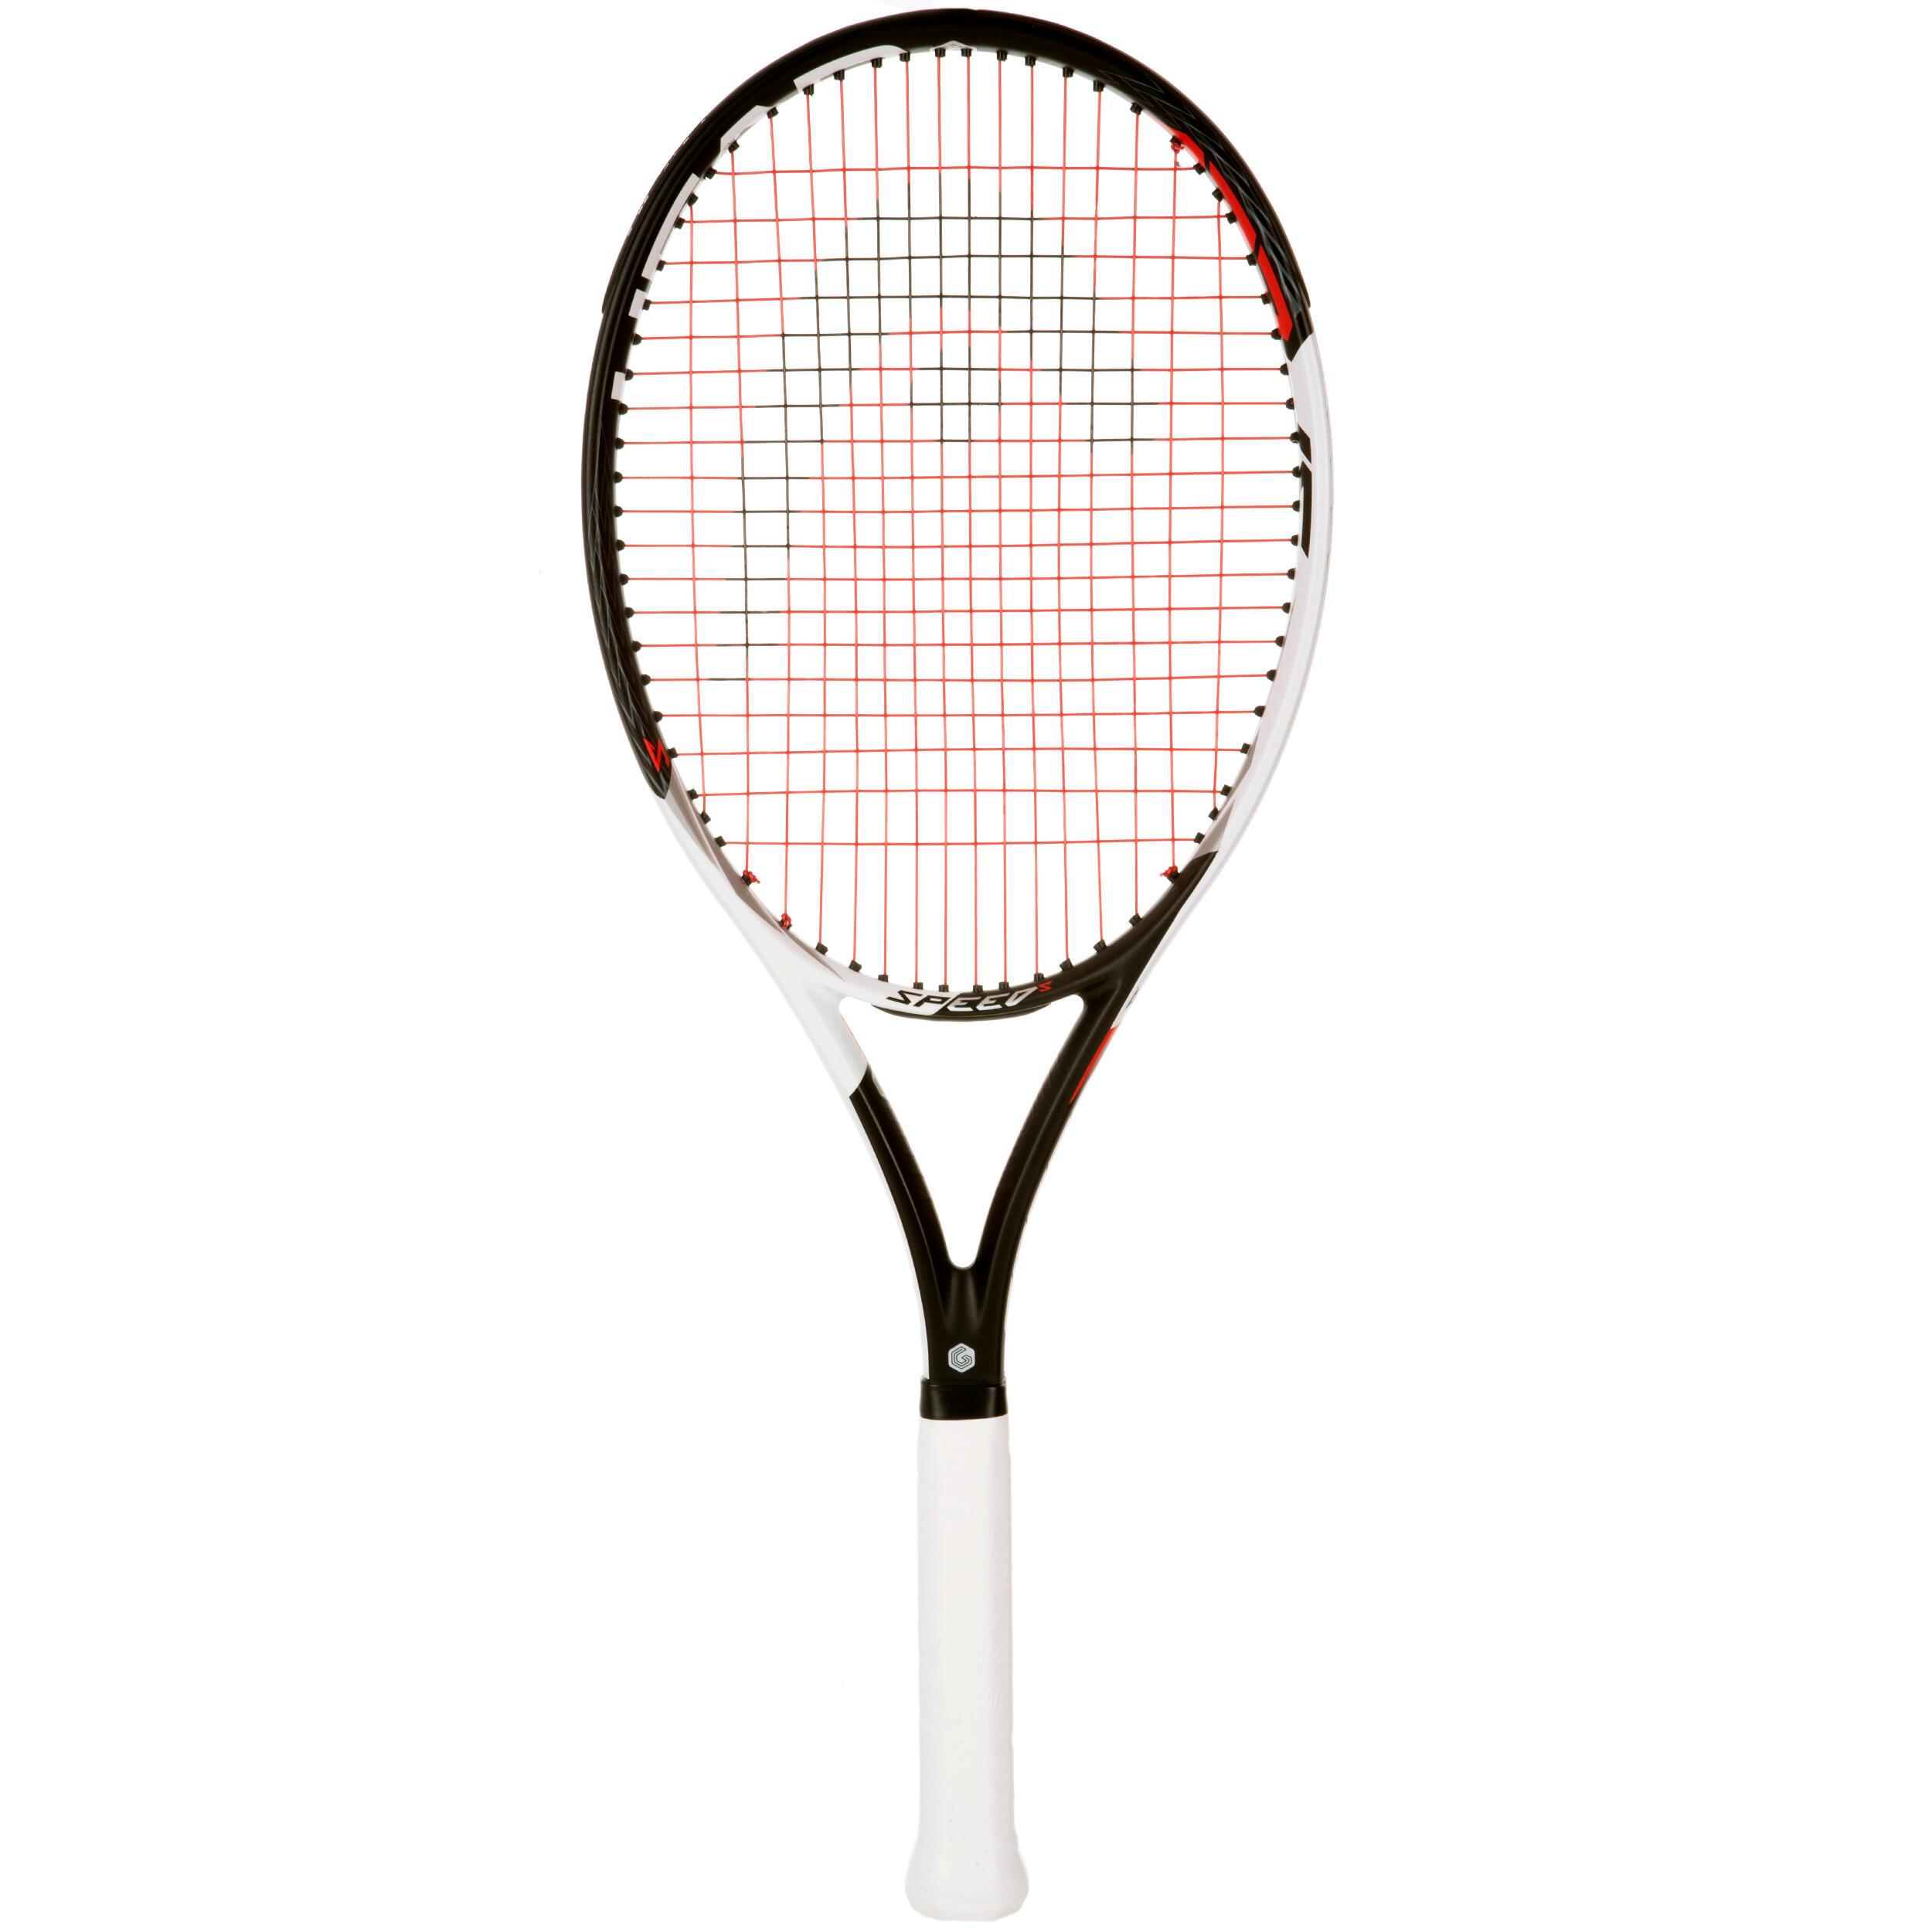 Head raquette de tennis speed s noir blanc decathlon - Raquette de tennis de table decathlon ...